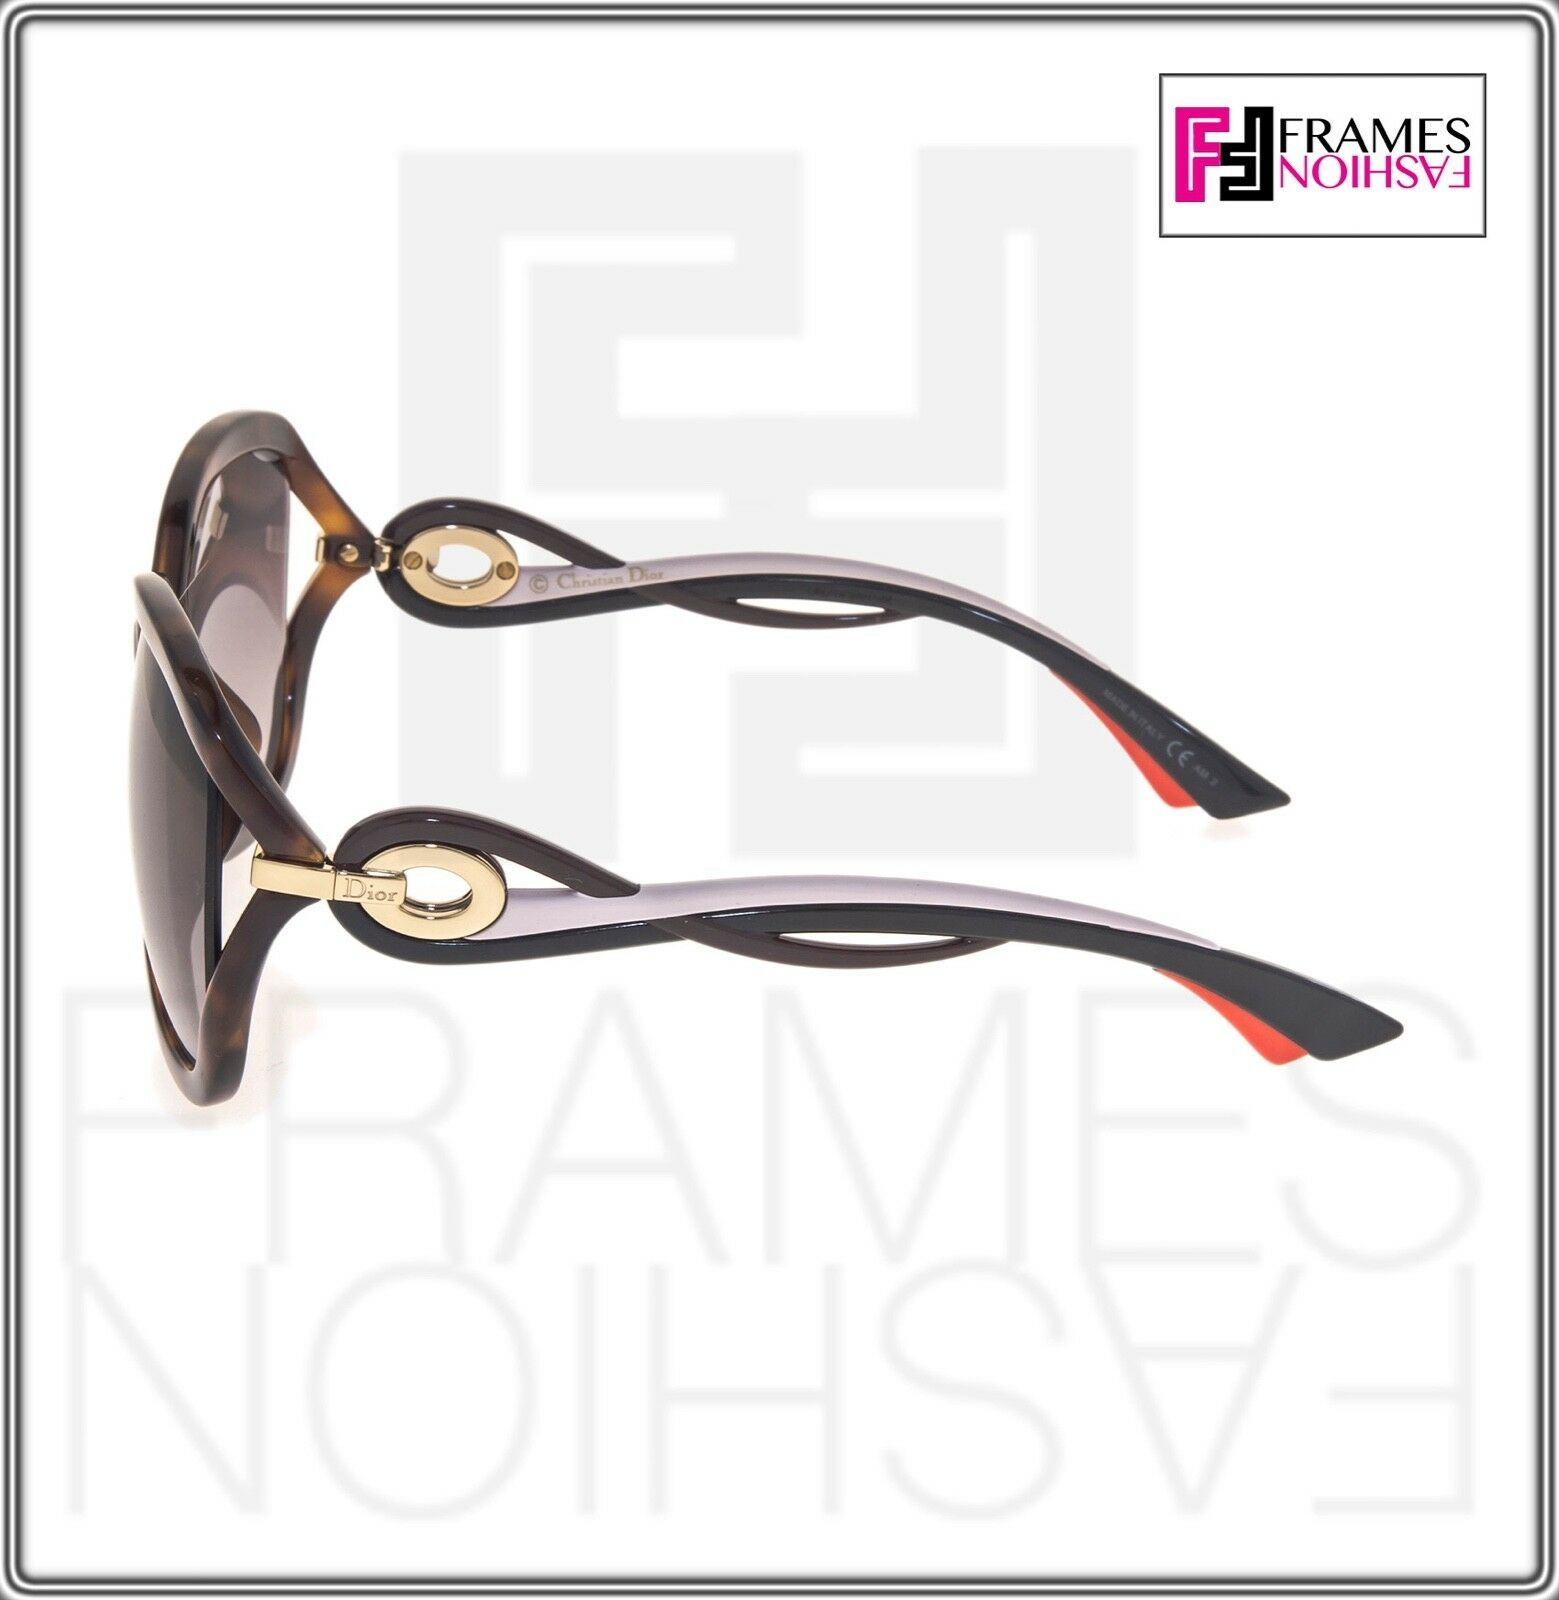 CHRISTIAN DIOR TWISTING Brown Havana Pink Rubber Gradient Sunglasses Authentic